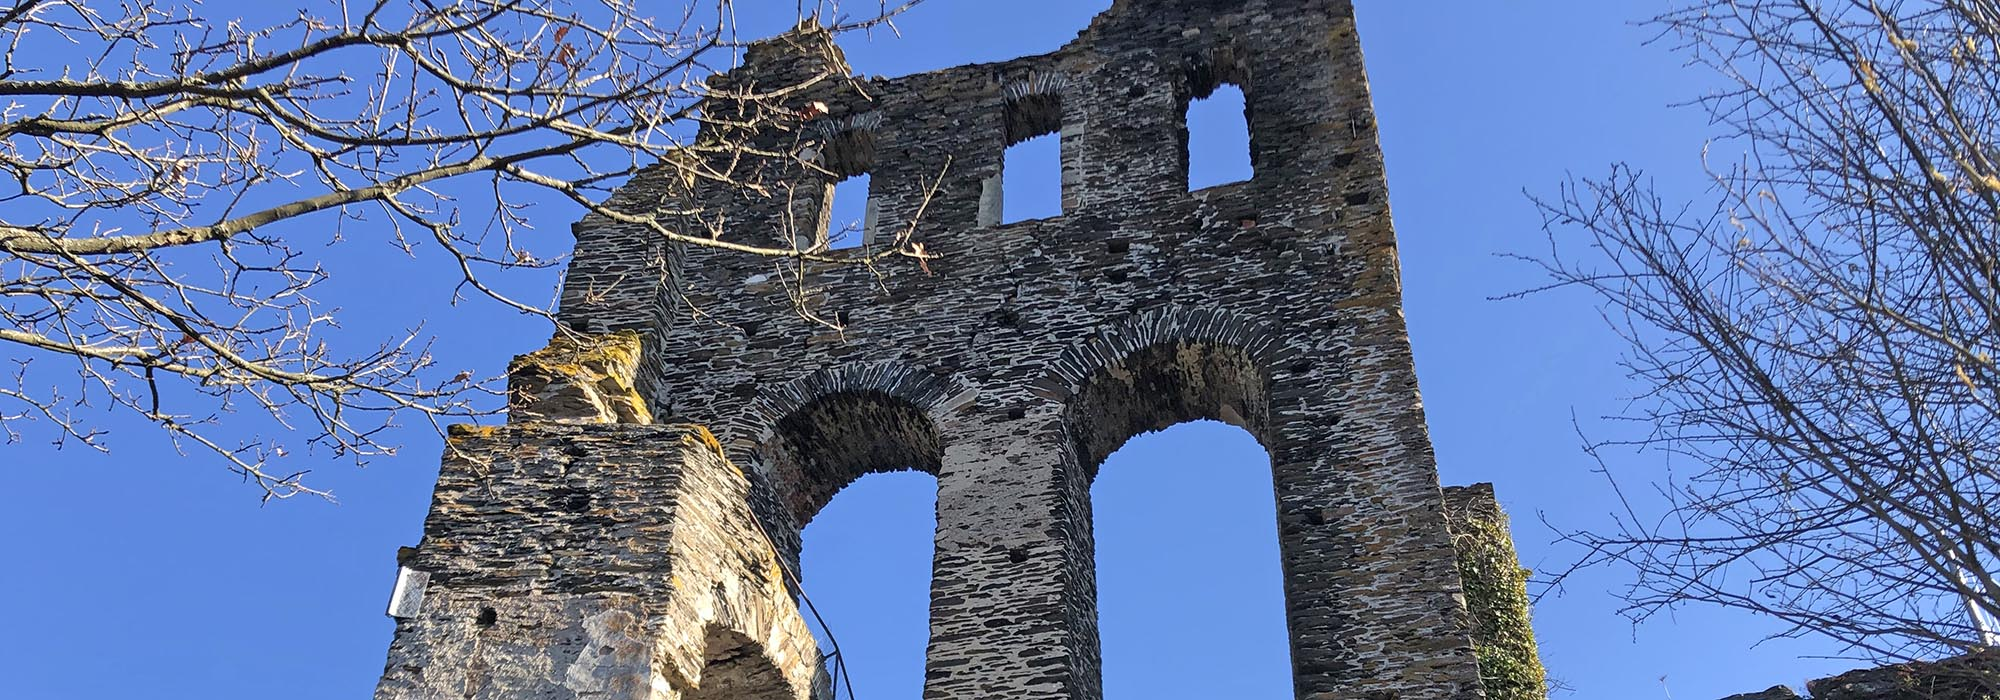 Grevenburg-IMG_3896